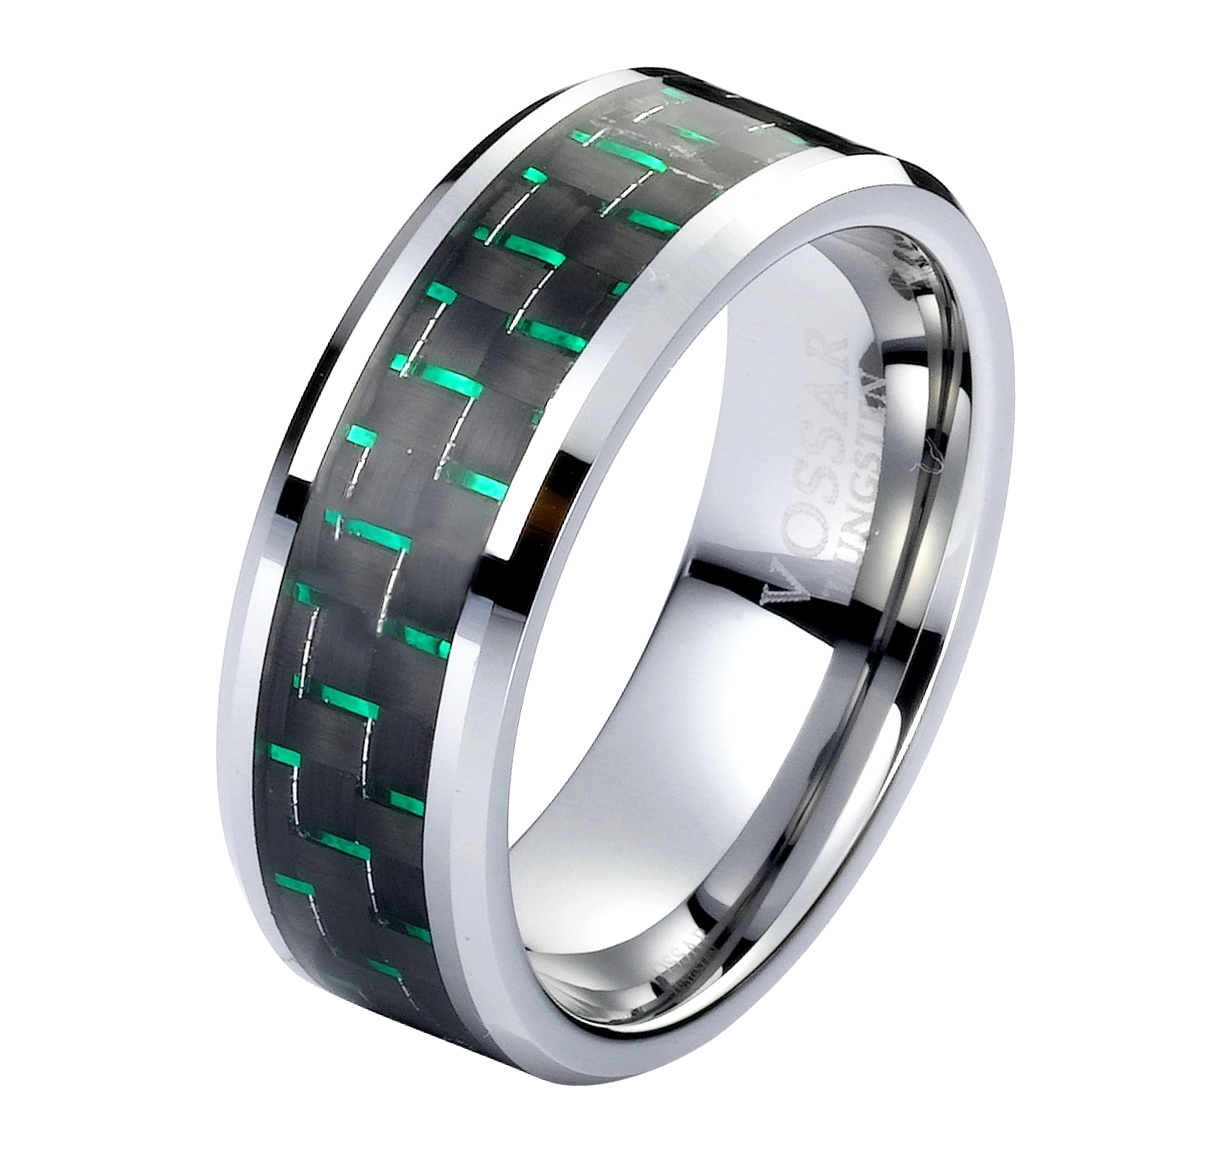 green wedding bands SWbrQzovEJ*phyChKEX*jYTXOi7amA carbon fiber wedding bands Carbon Fiber Inlay 8mm Wedding Bands For Green